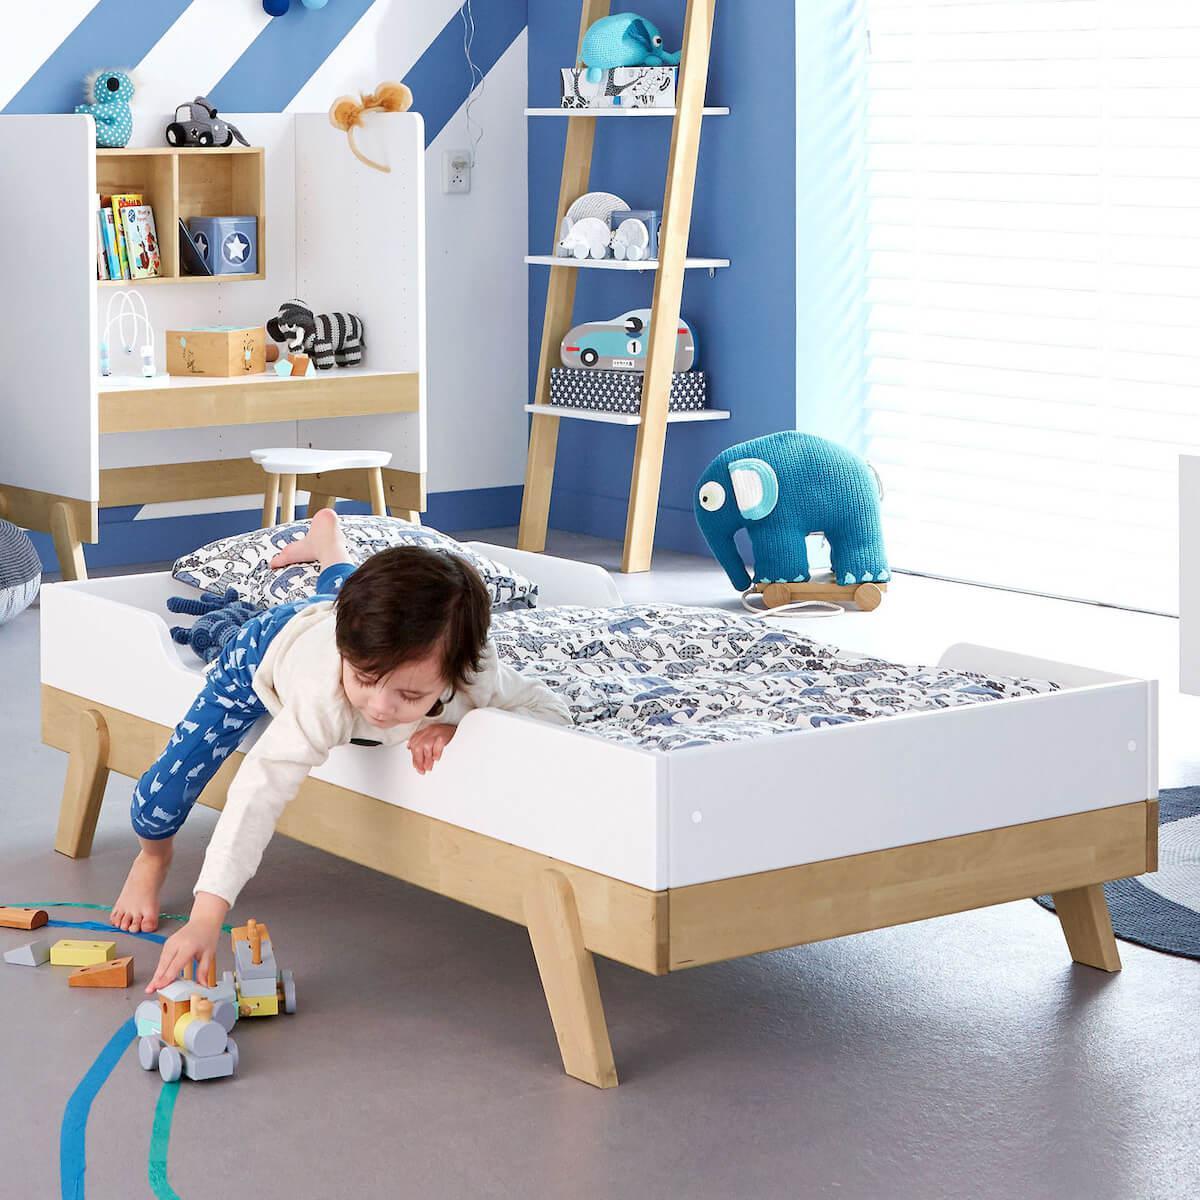 Cama infantil 70x140cm Lifetime